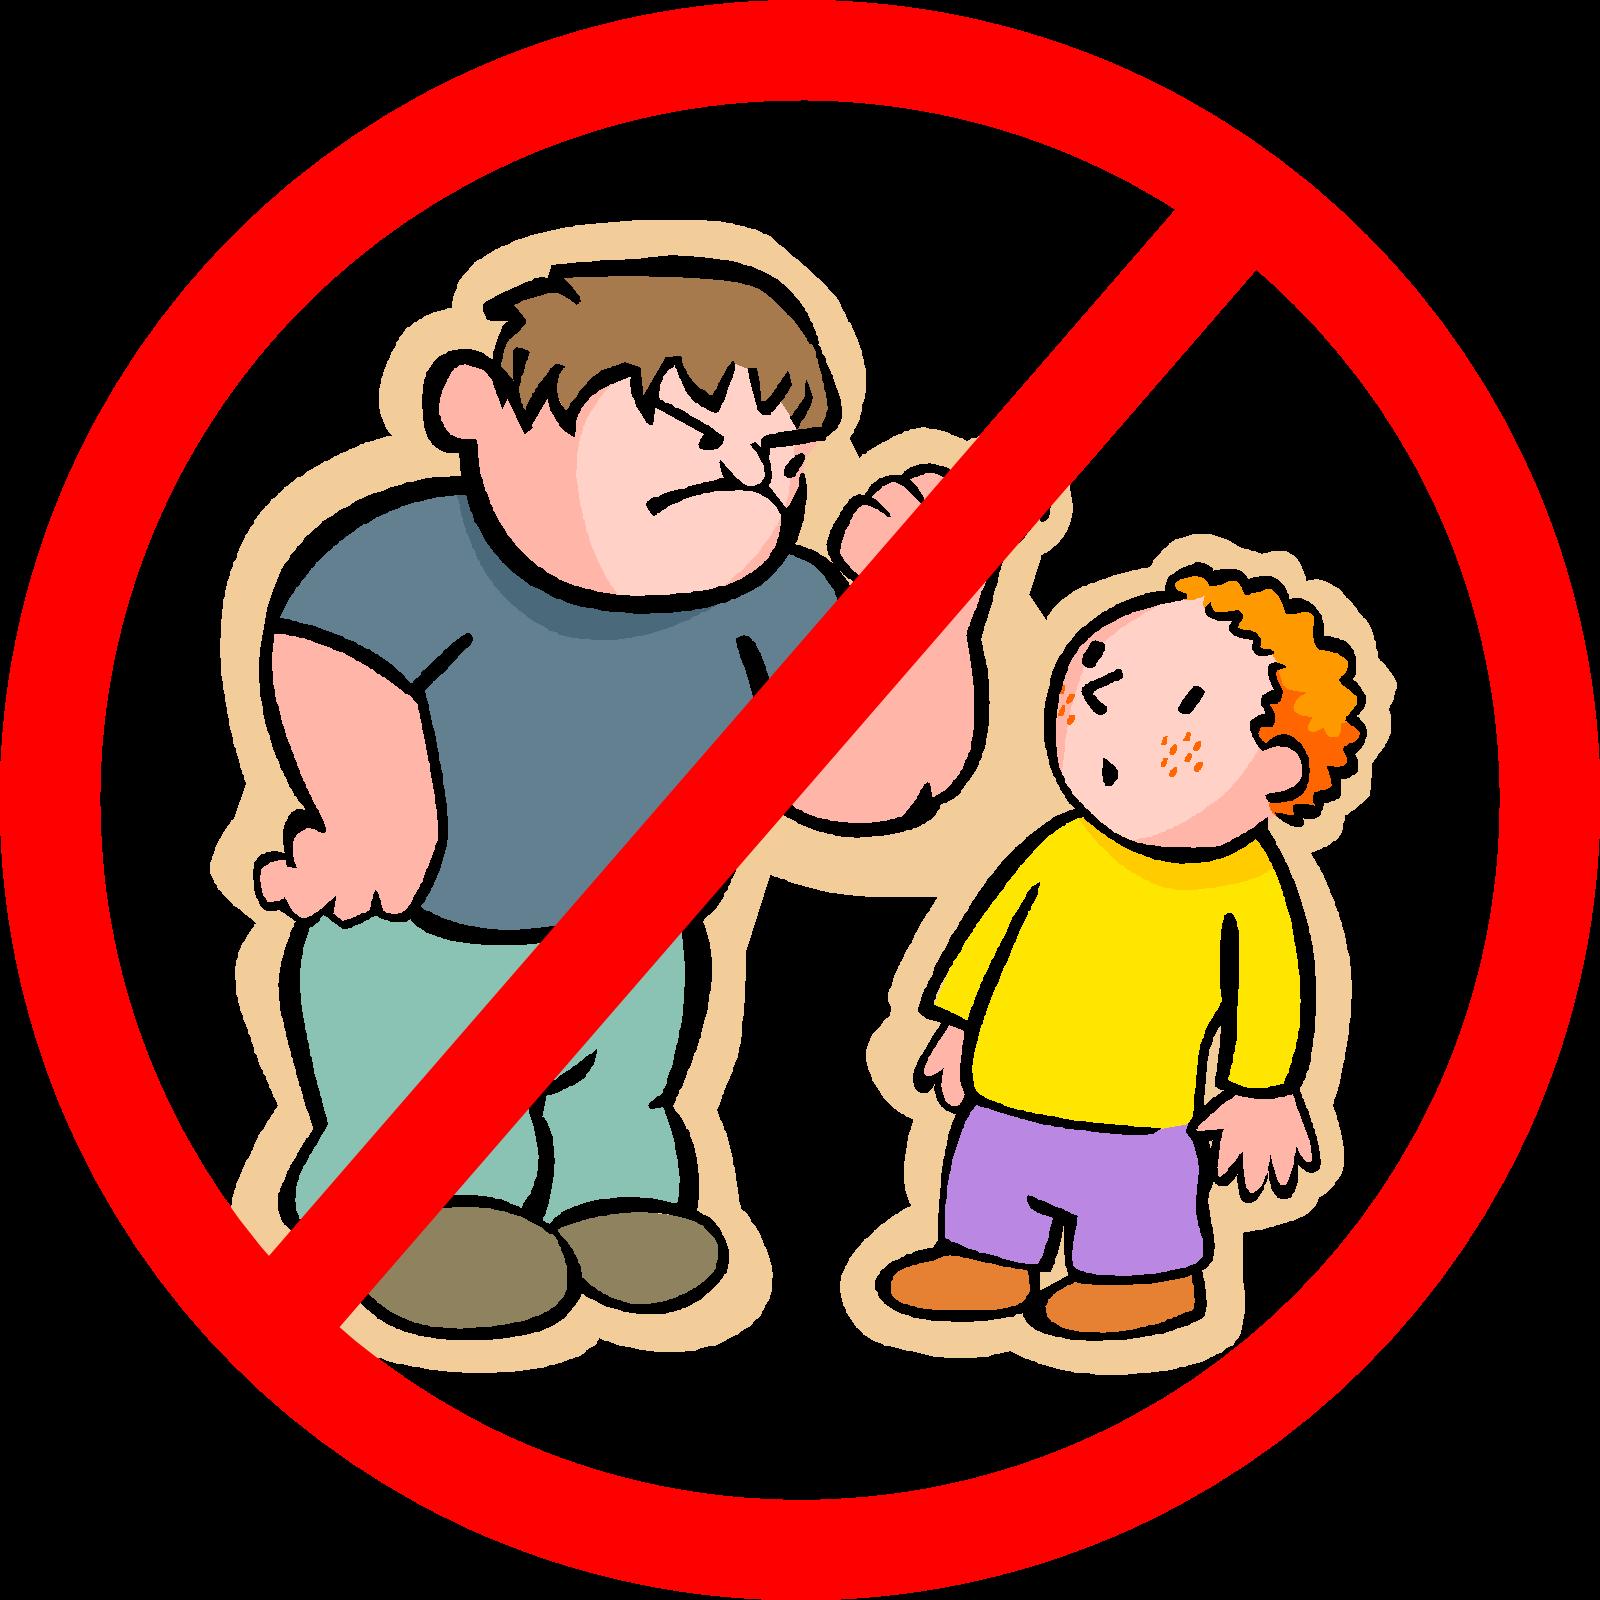 Kindergarten preschool for parents. Yelling clipart relational bullying